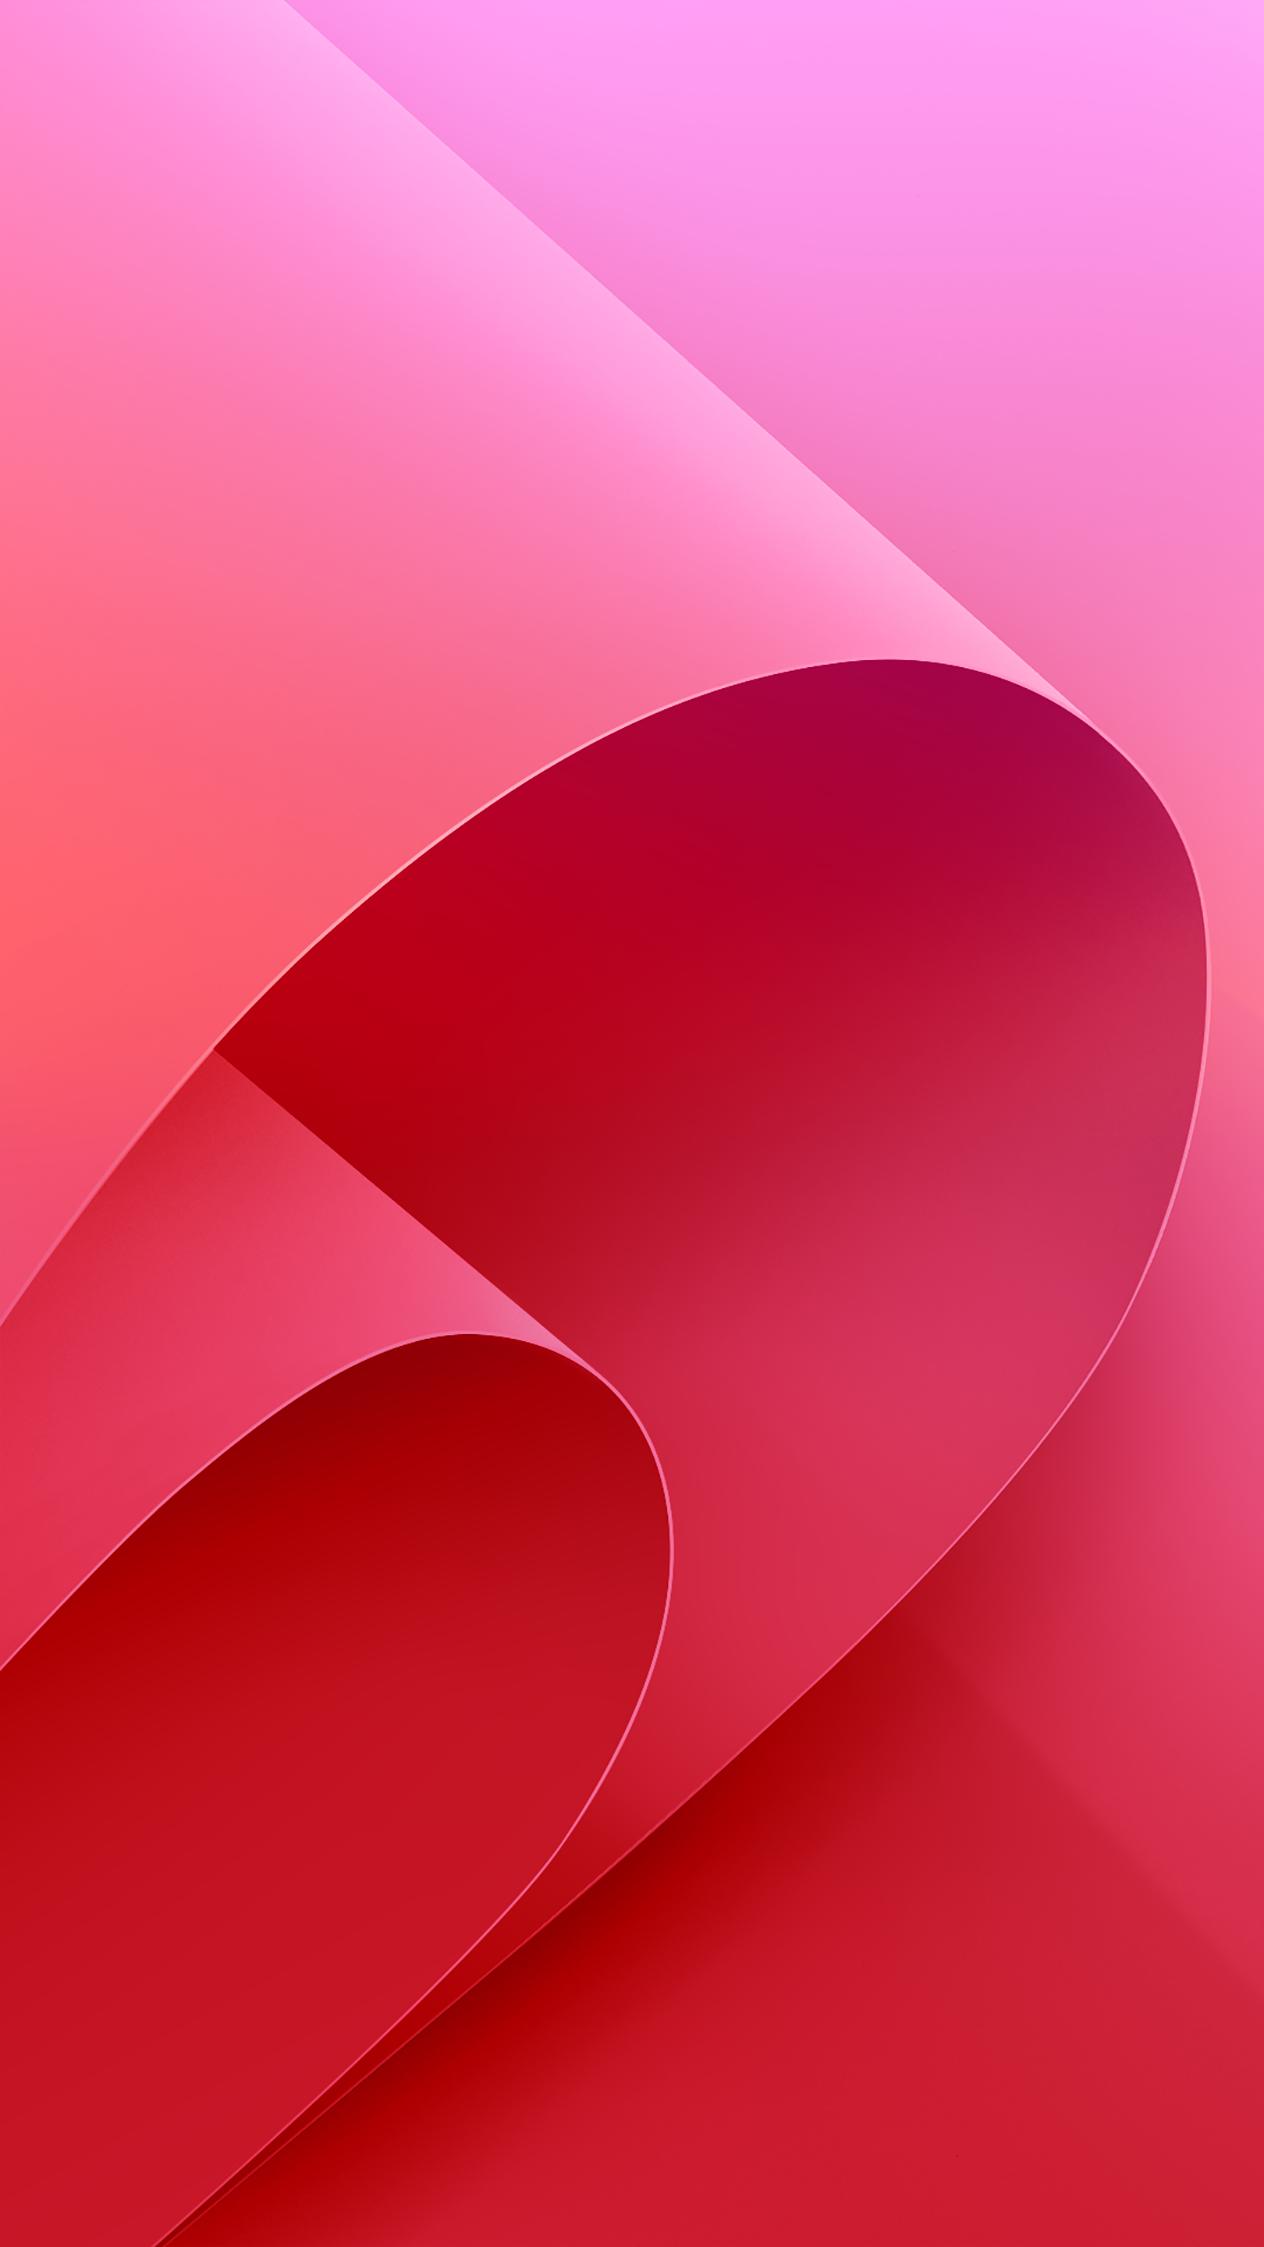 ASUS ZenFone Max Pro M2 Wallpapers - Wallpaper Cave